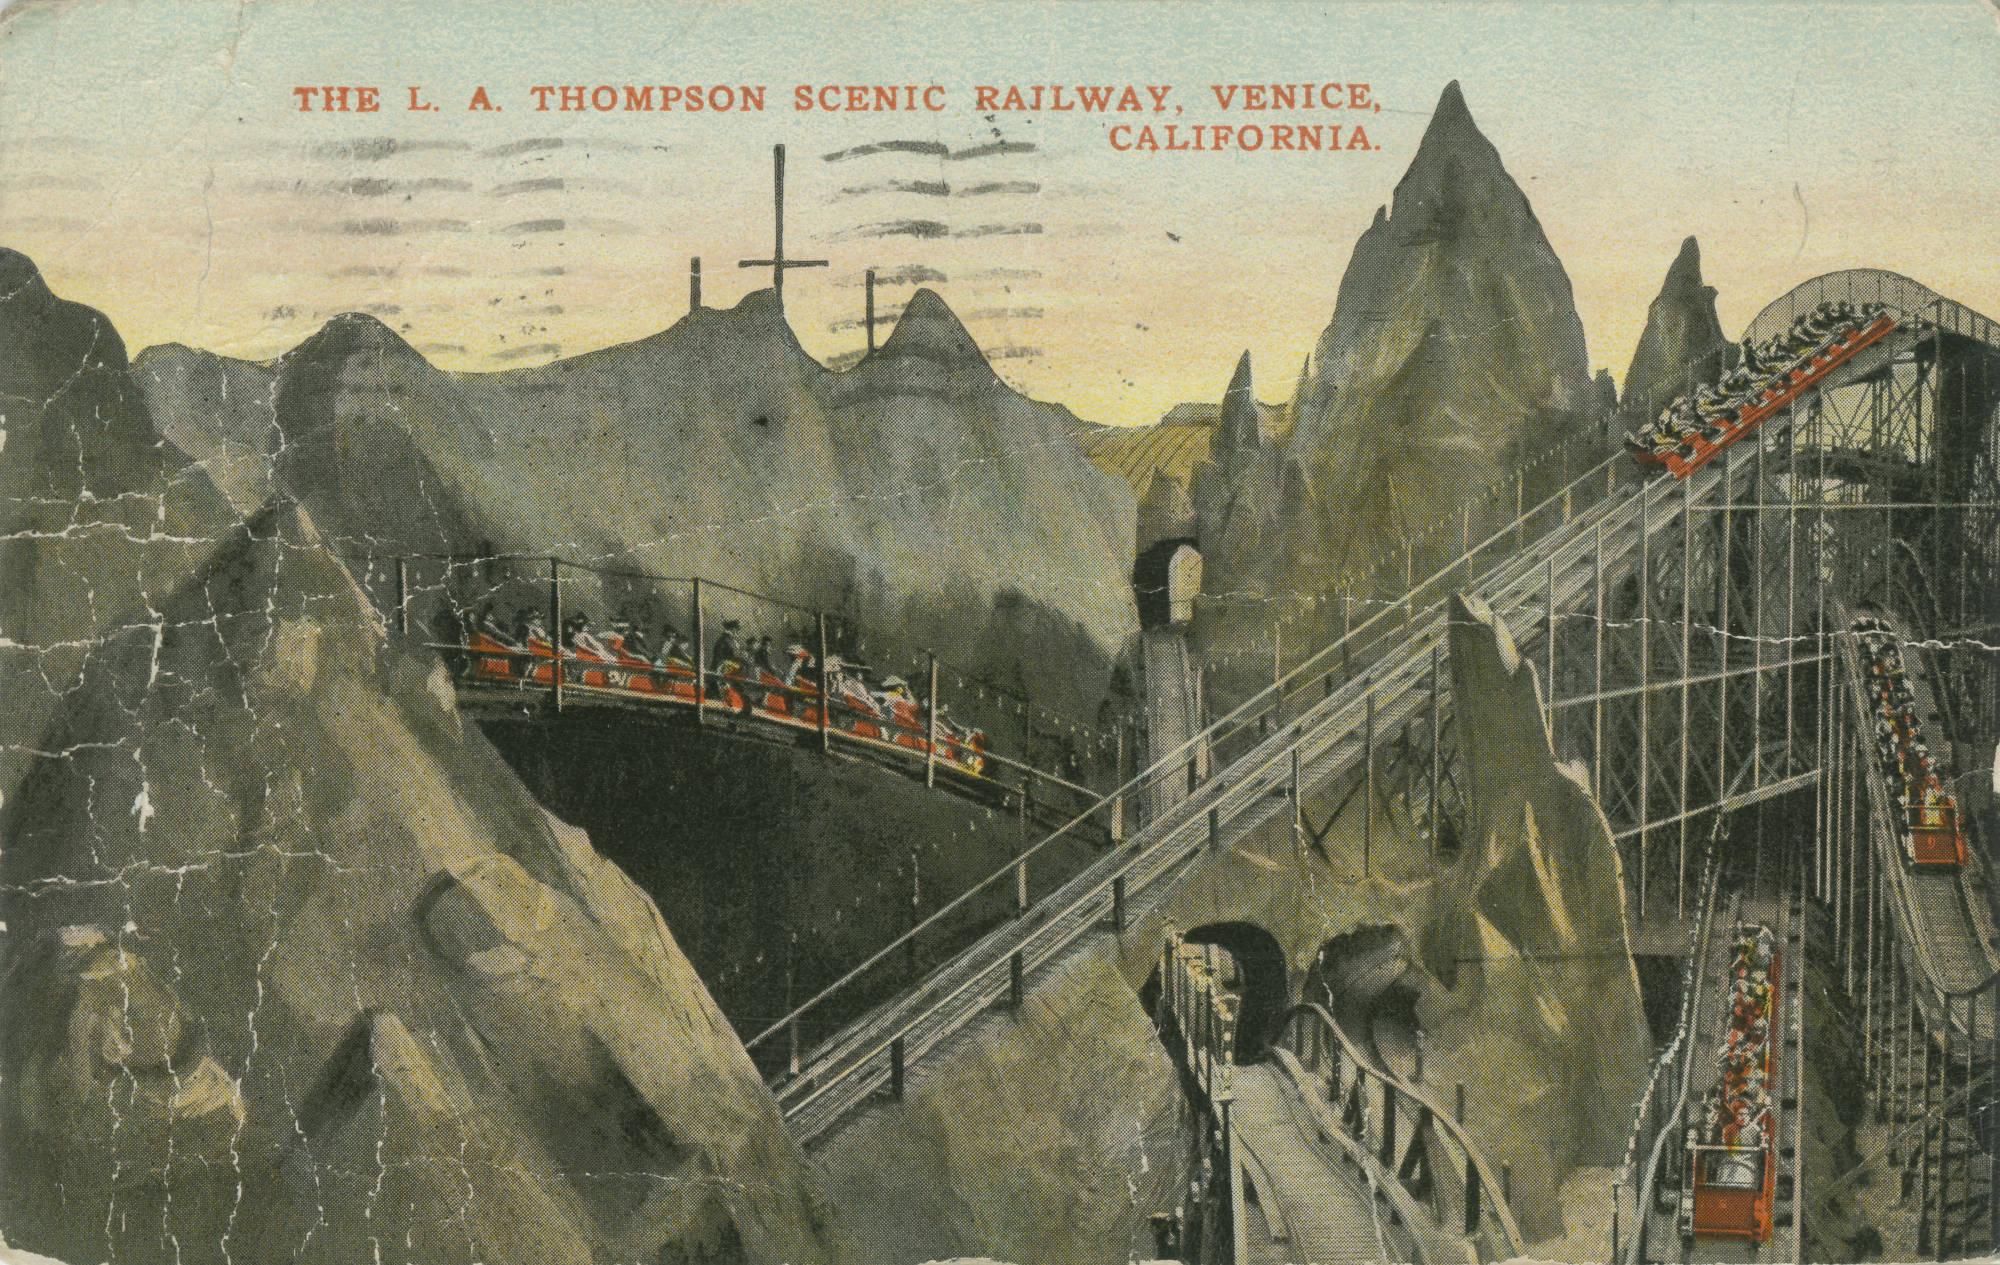 Postcard of the L. A. Thompson Scenic Railway